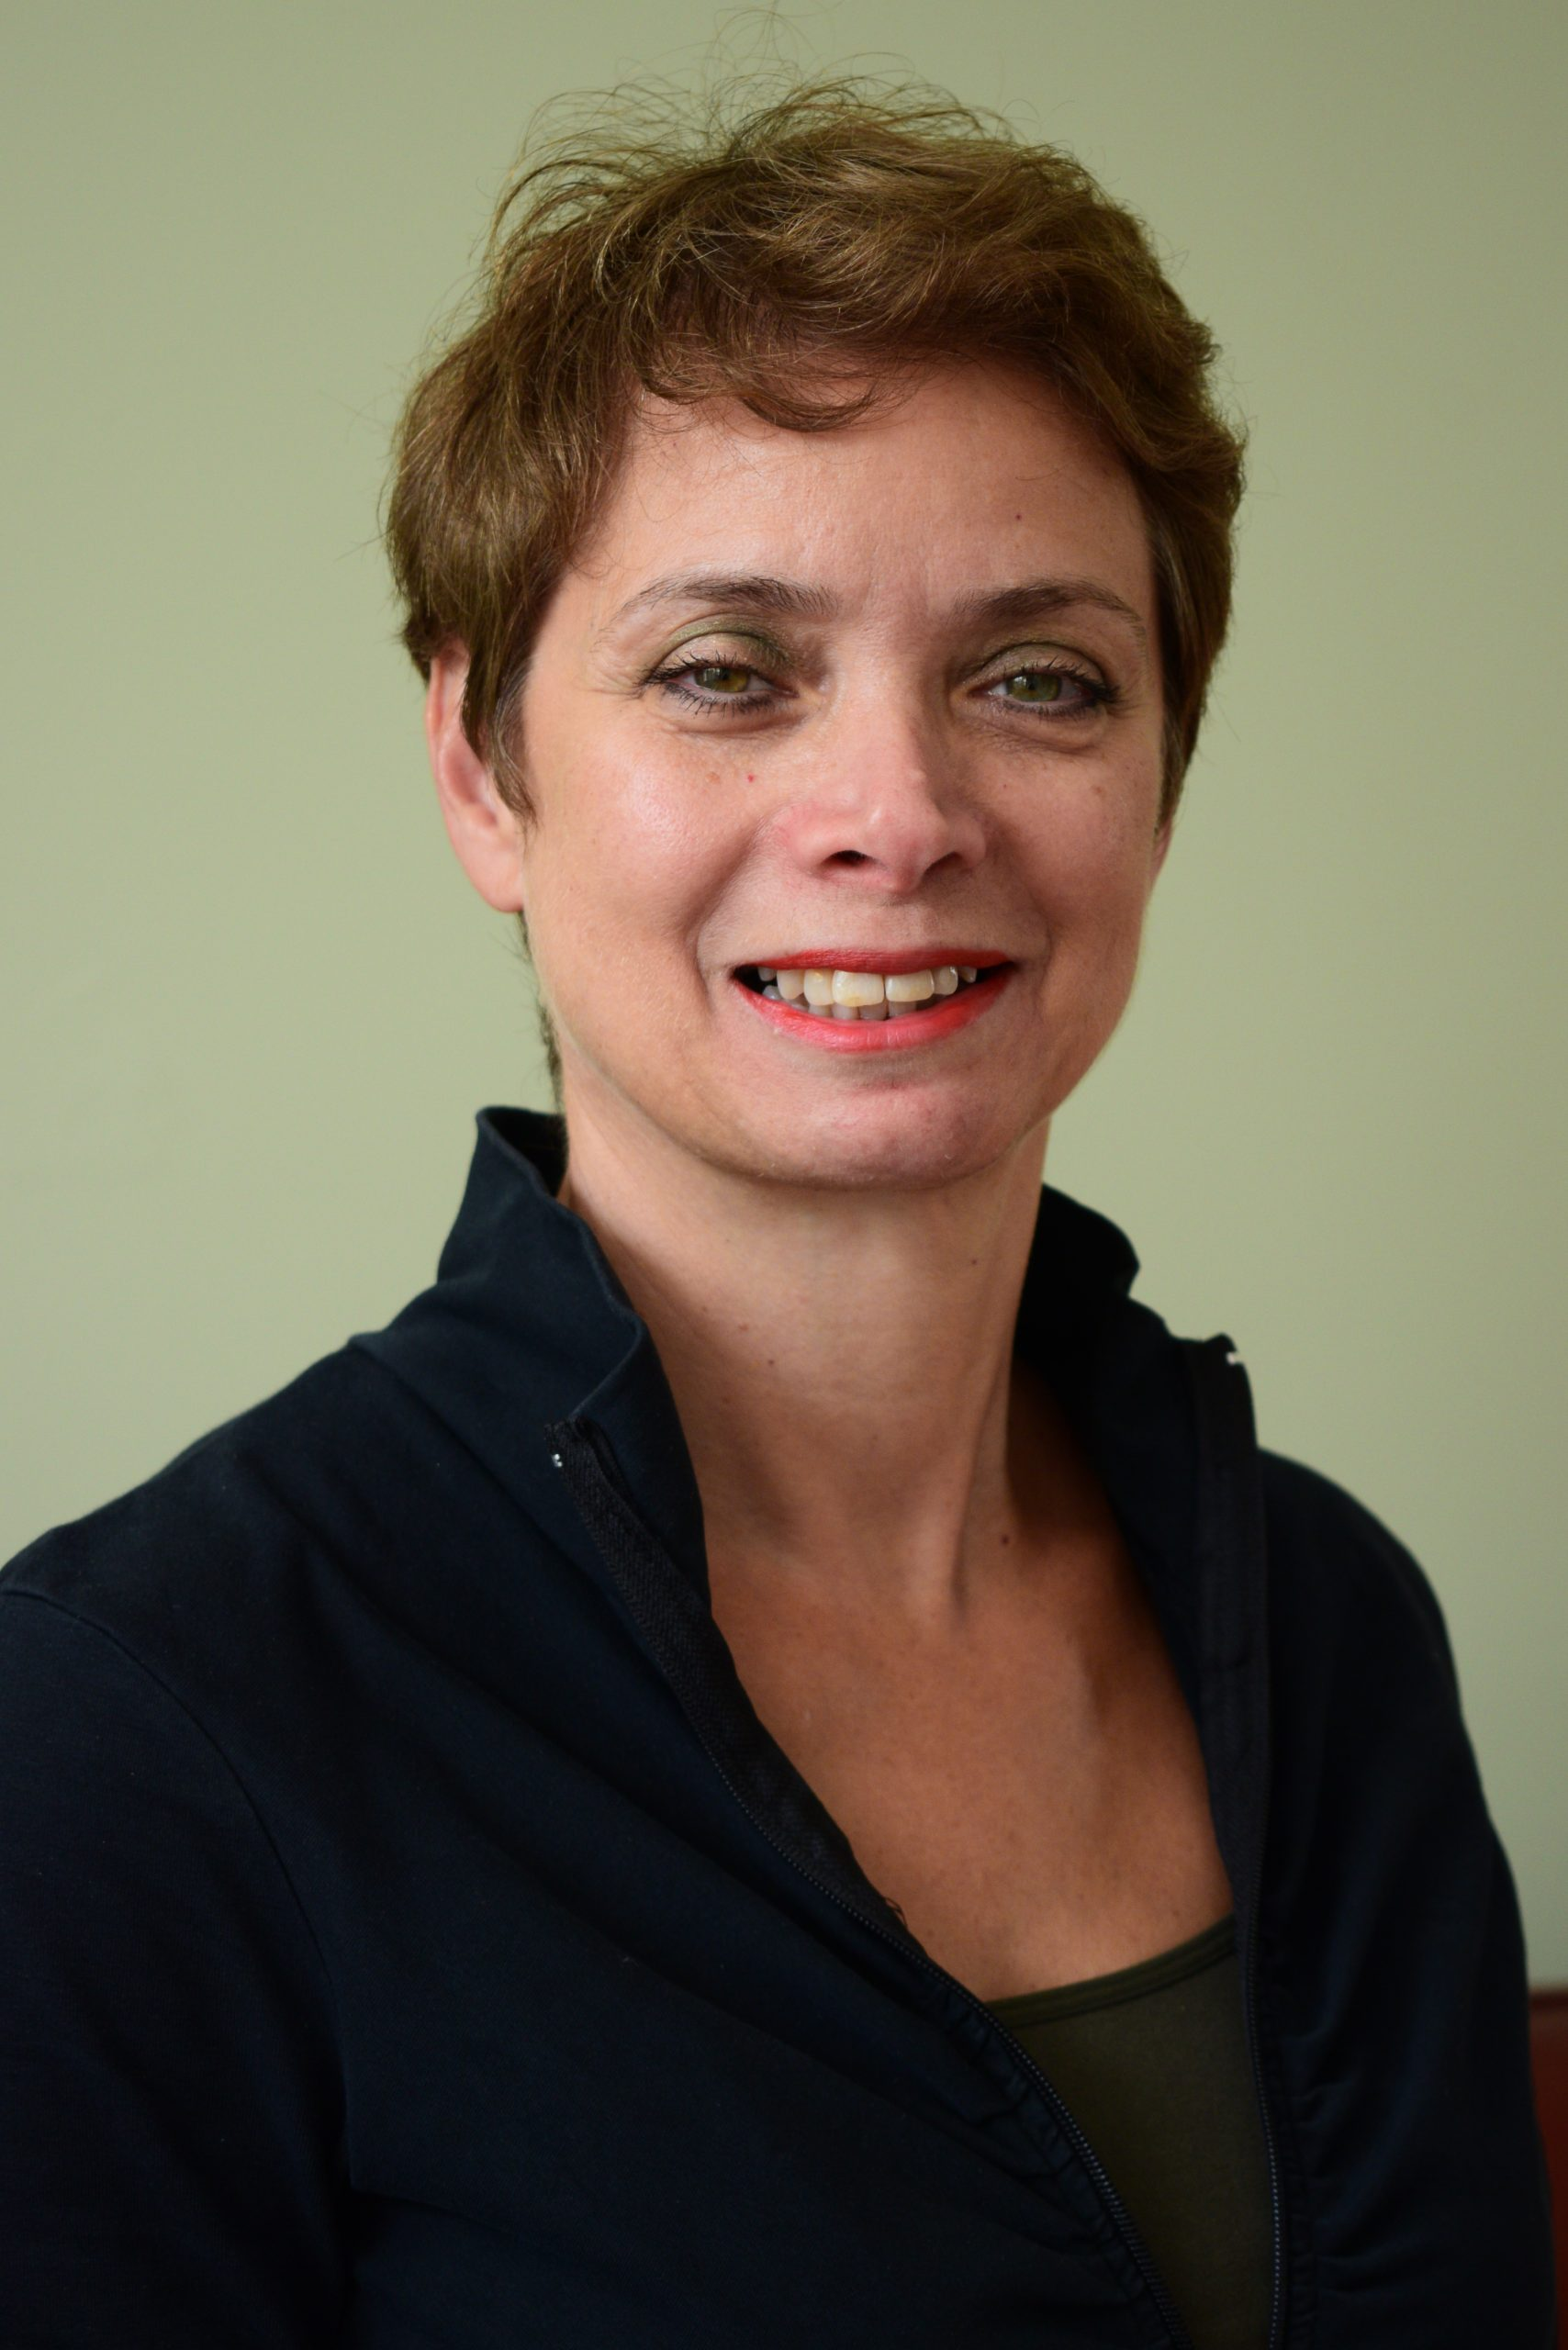 Amanda Hamilton